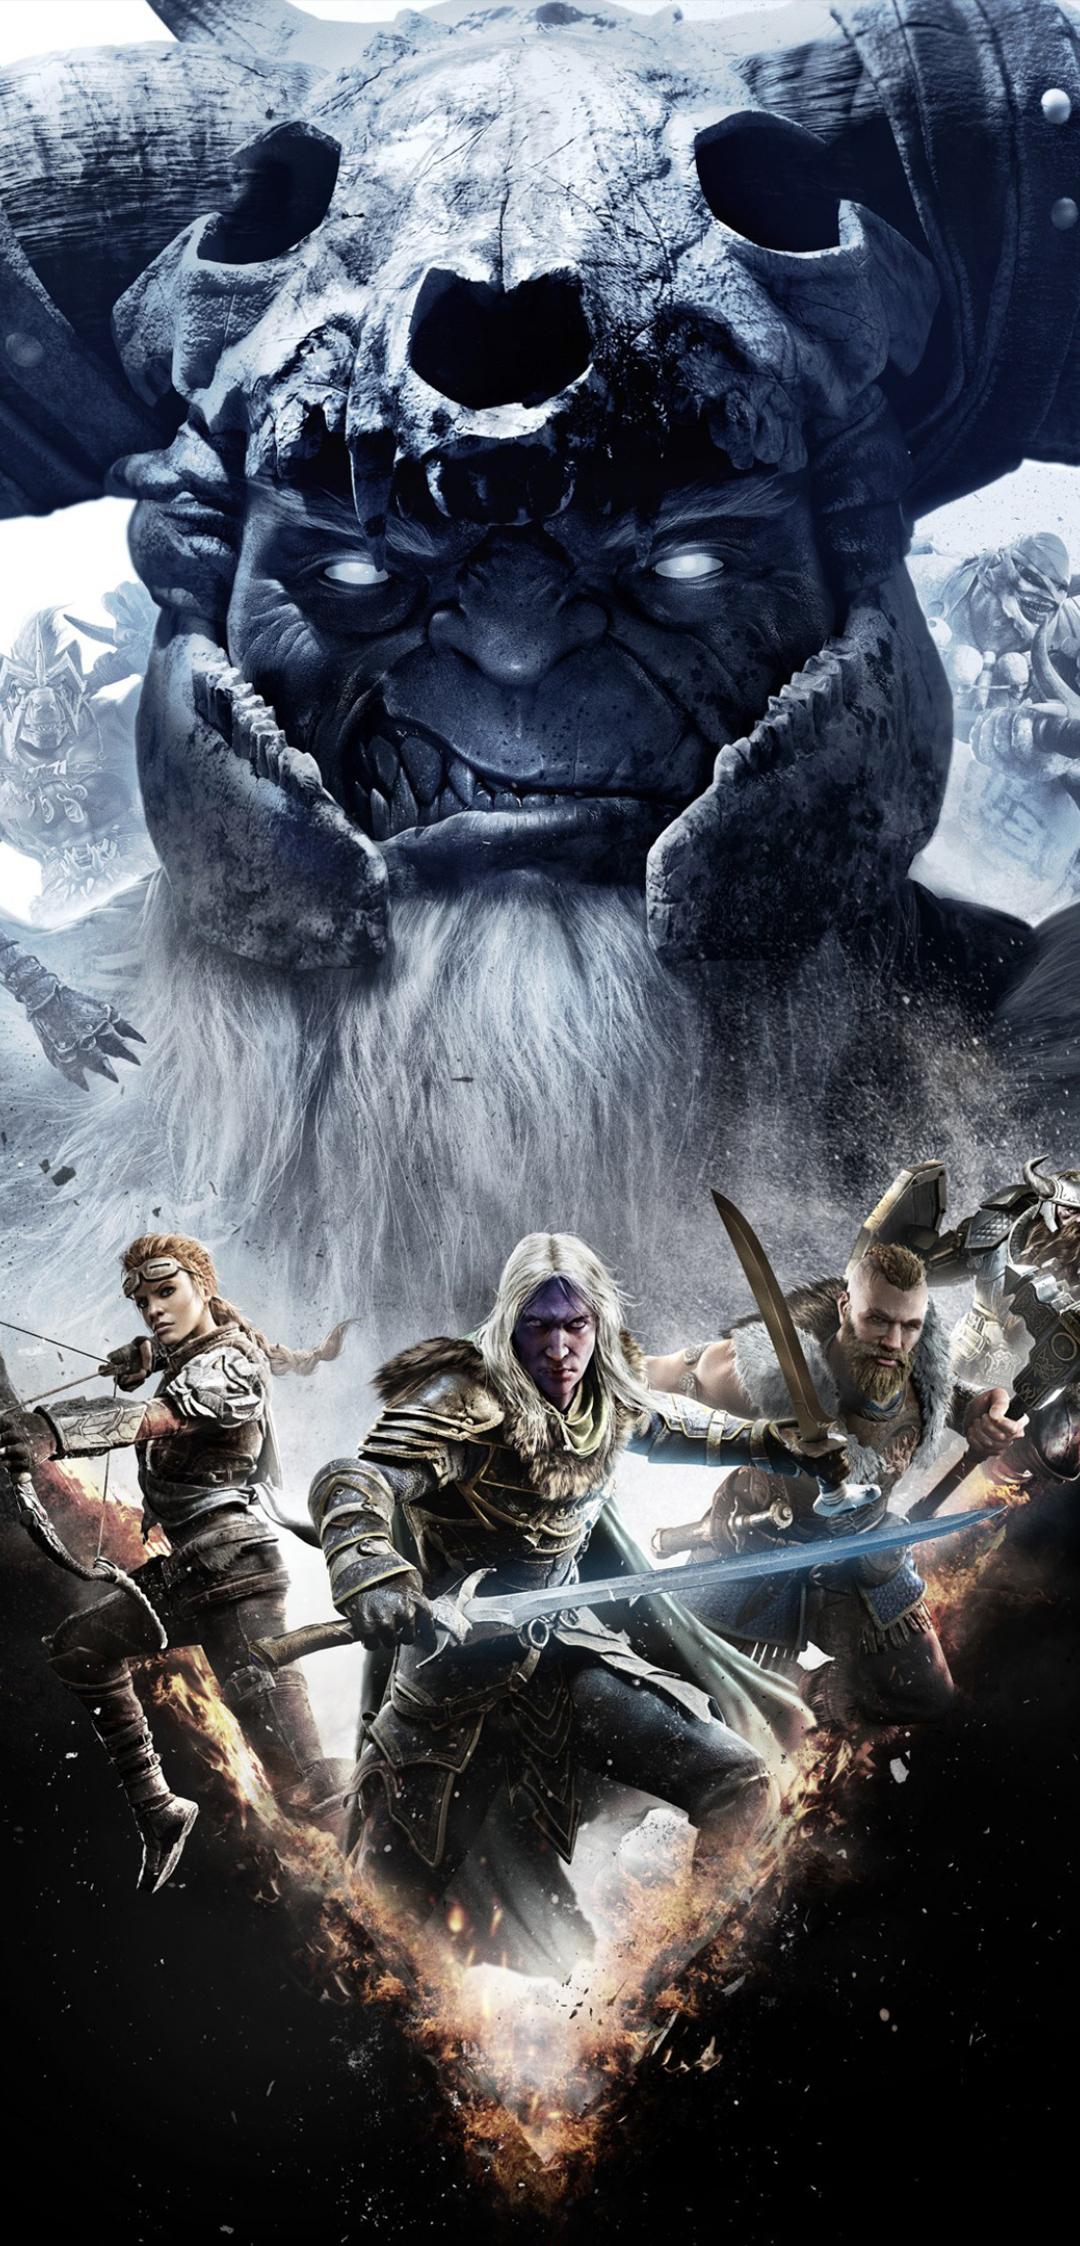 1080x2246 Dungeons And Dragons Dark Alliance 1080x2246 Resolution